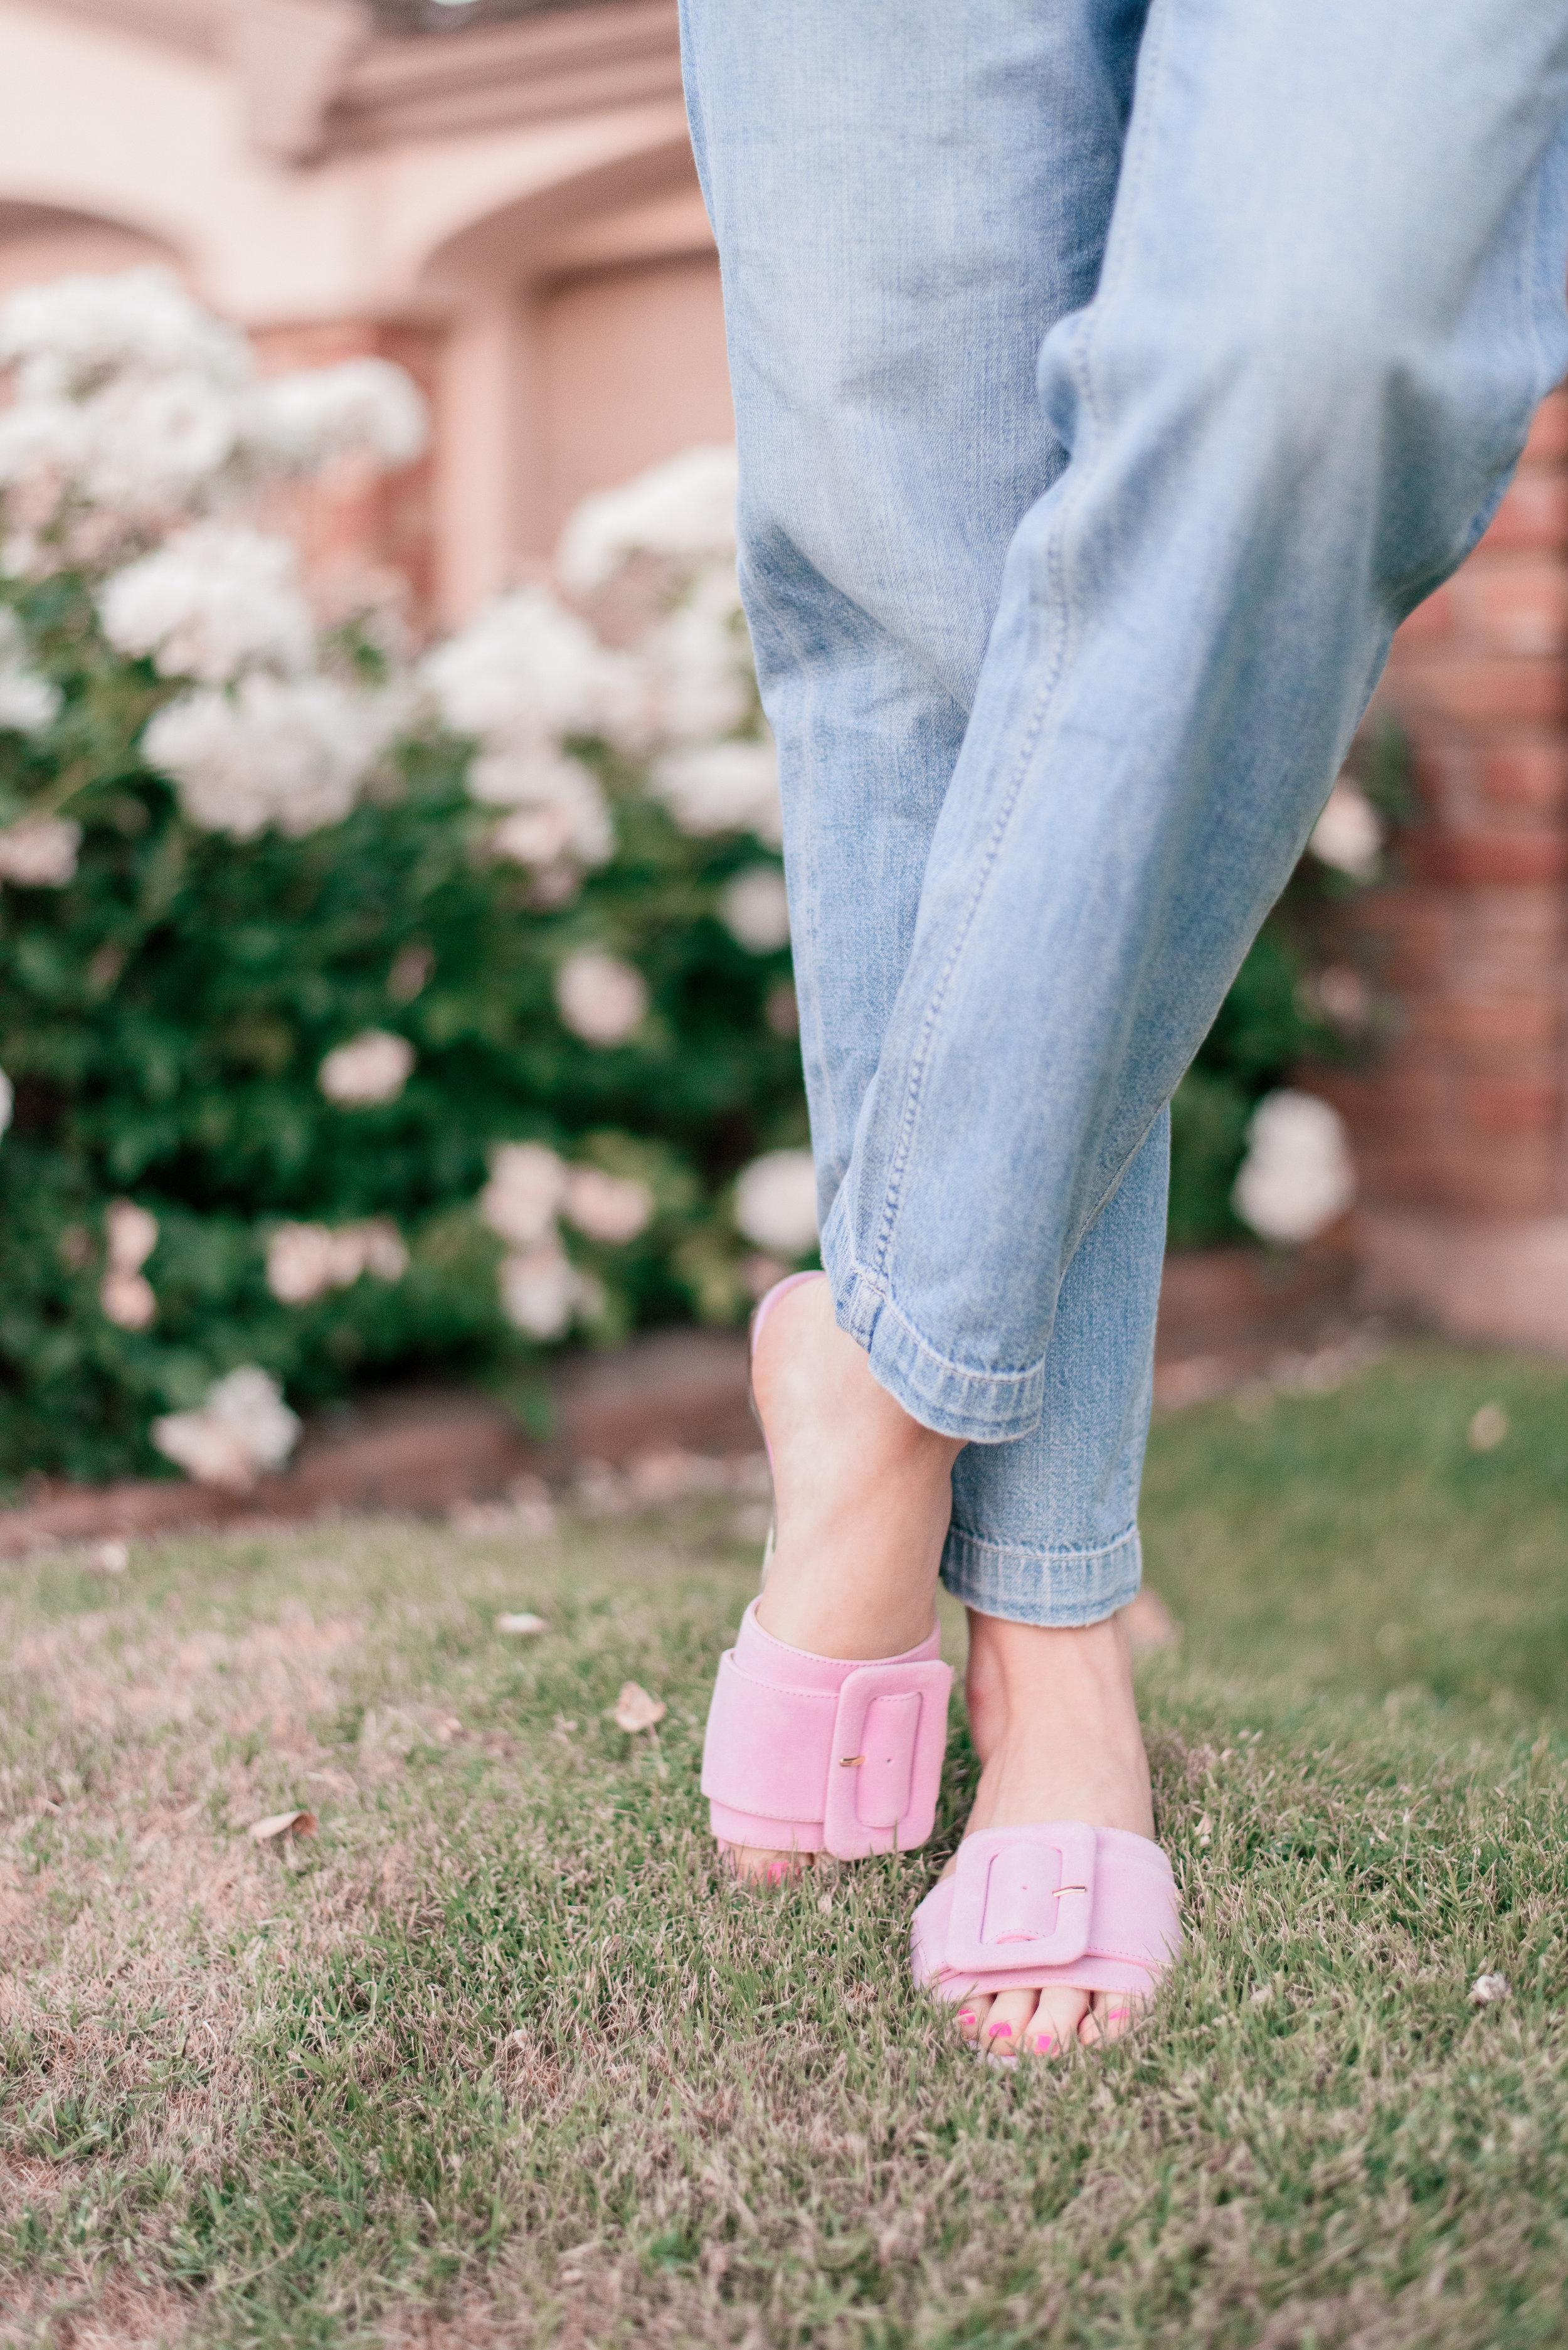 J.Crew Cora Buckle Slide Sandal Pink Suede